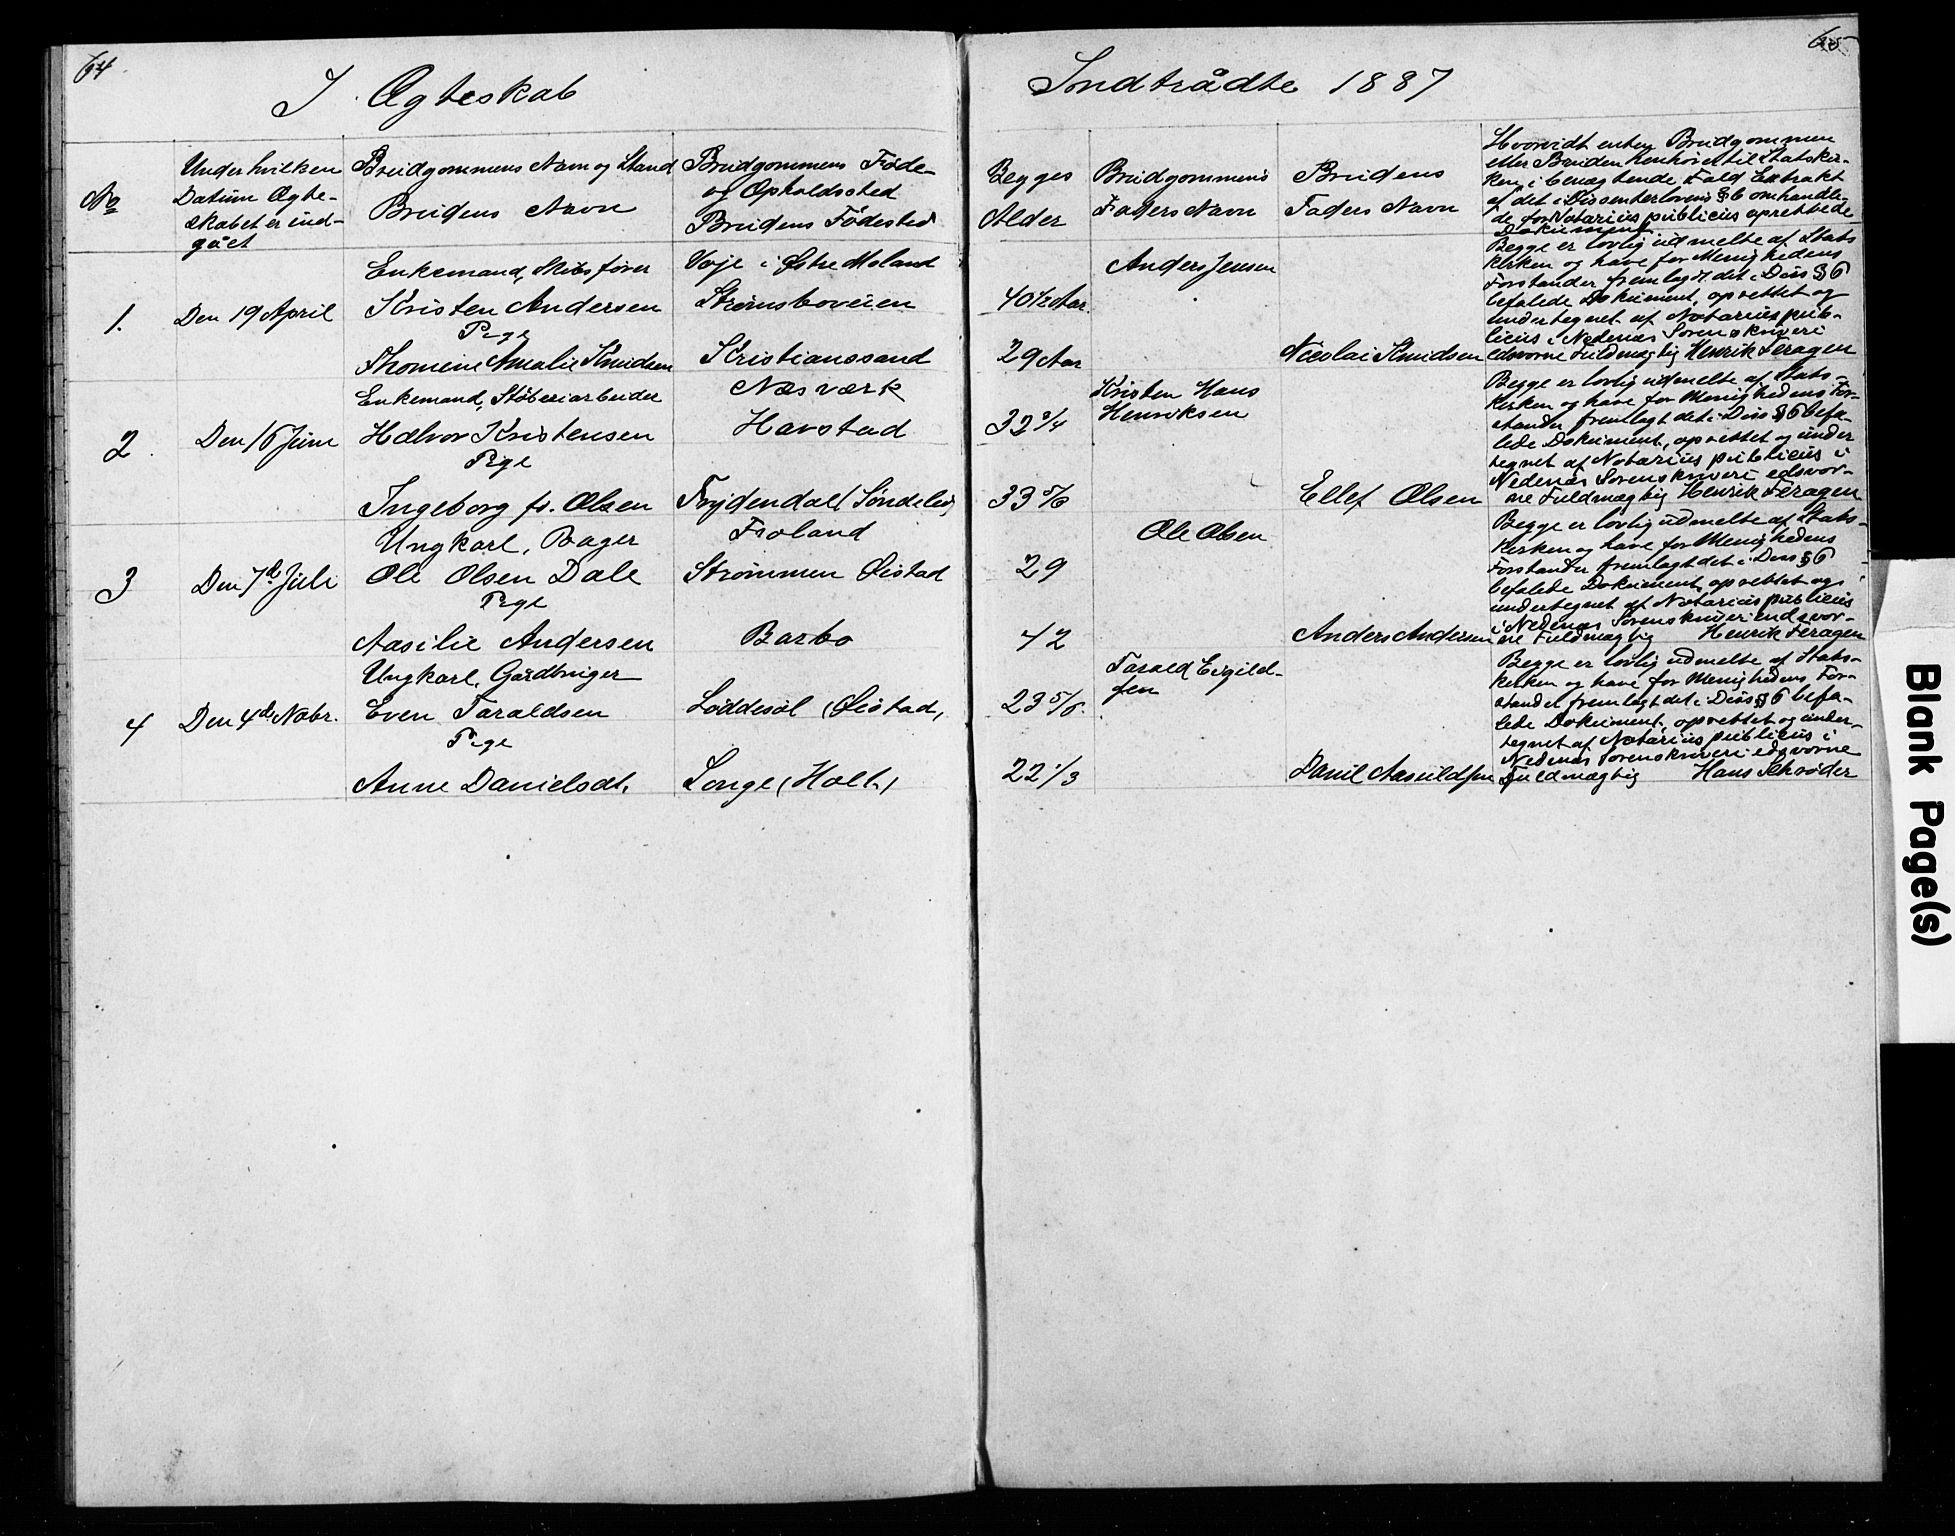 SAK, Den evangelisk-lutherske frimenighet, Arendal, F/Fa/L0003: Dissenterprotokoll nr. F 7, 1887-1887, s. 64-65